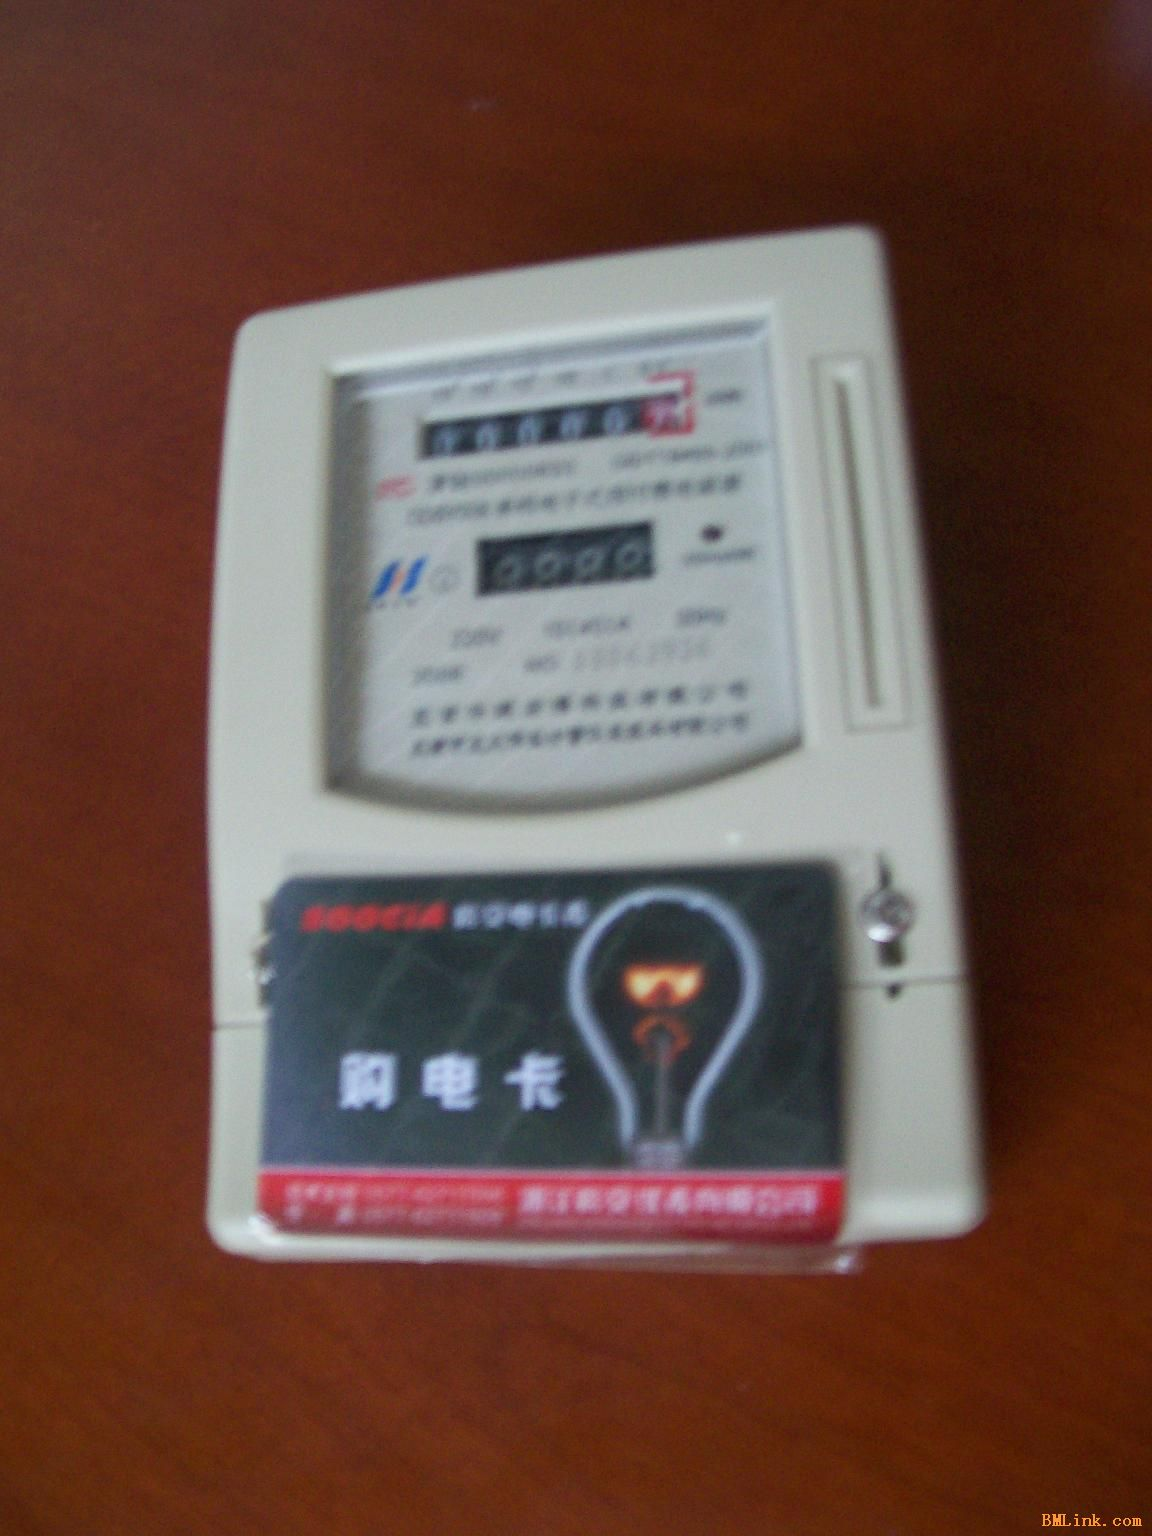 JPG,270x182,134KB,267_180 工业多功能电度表